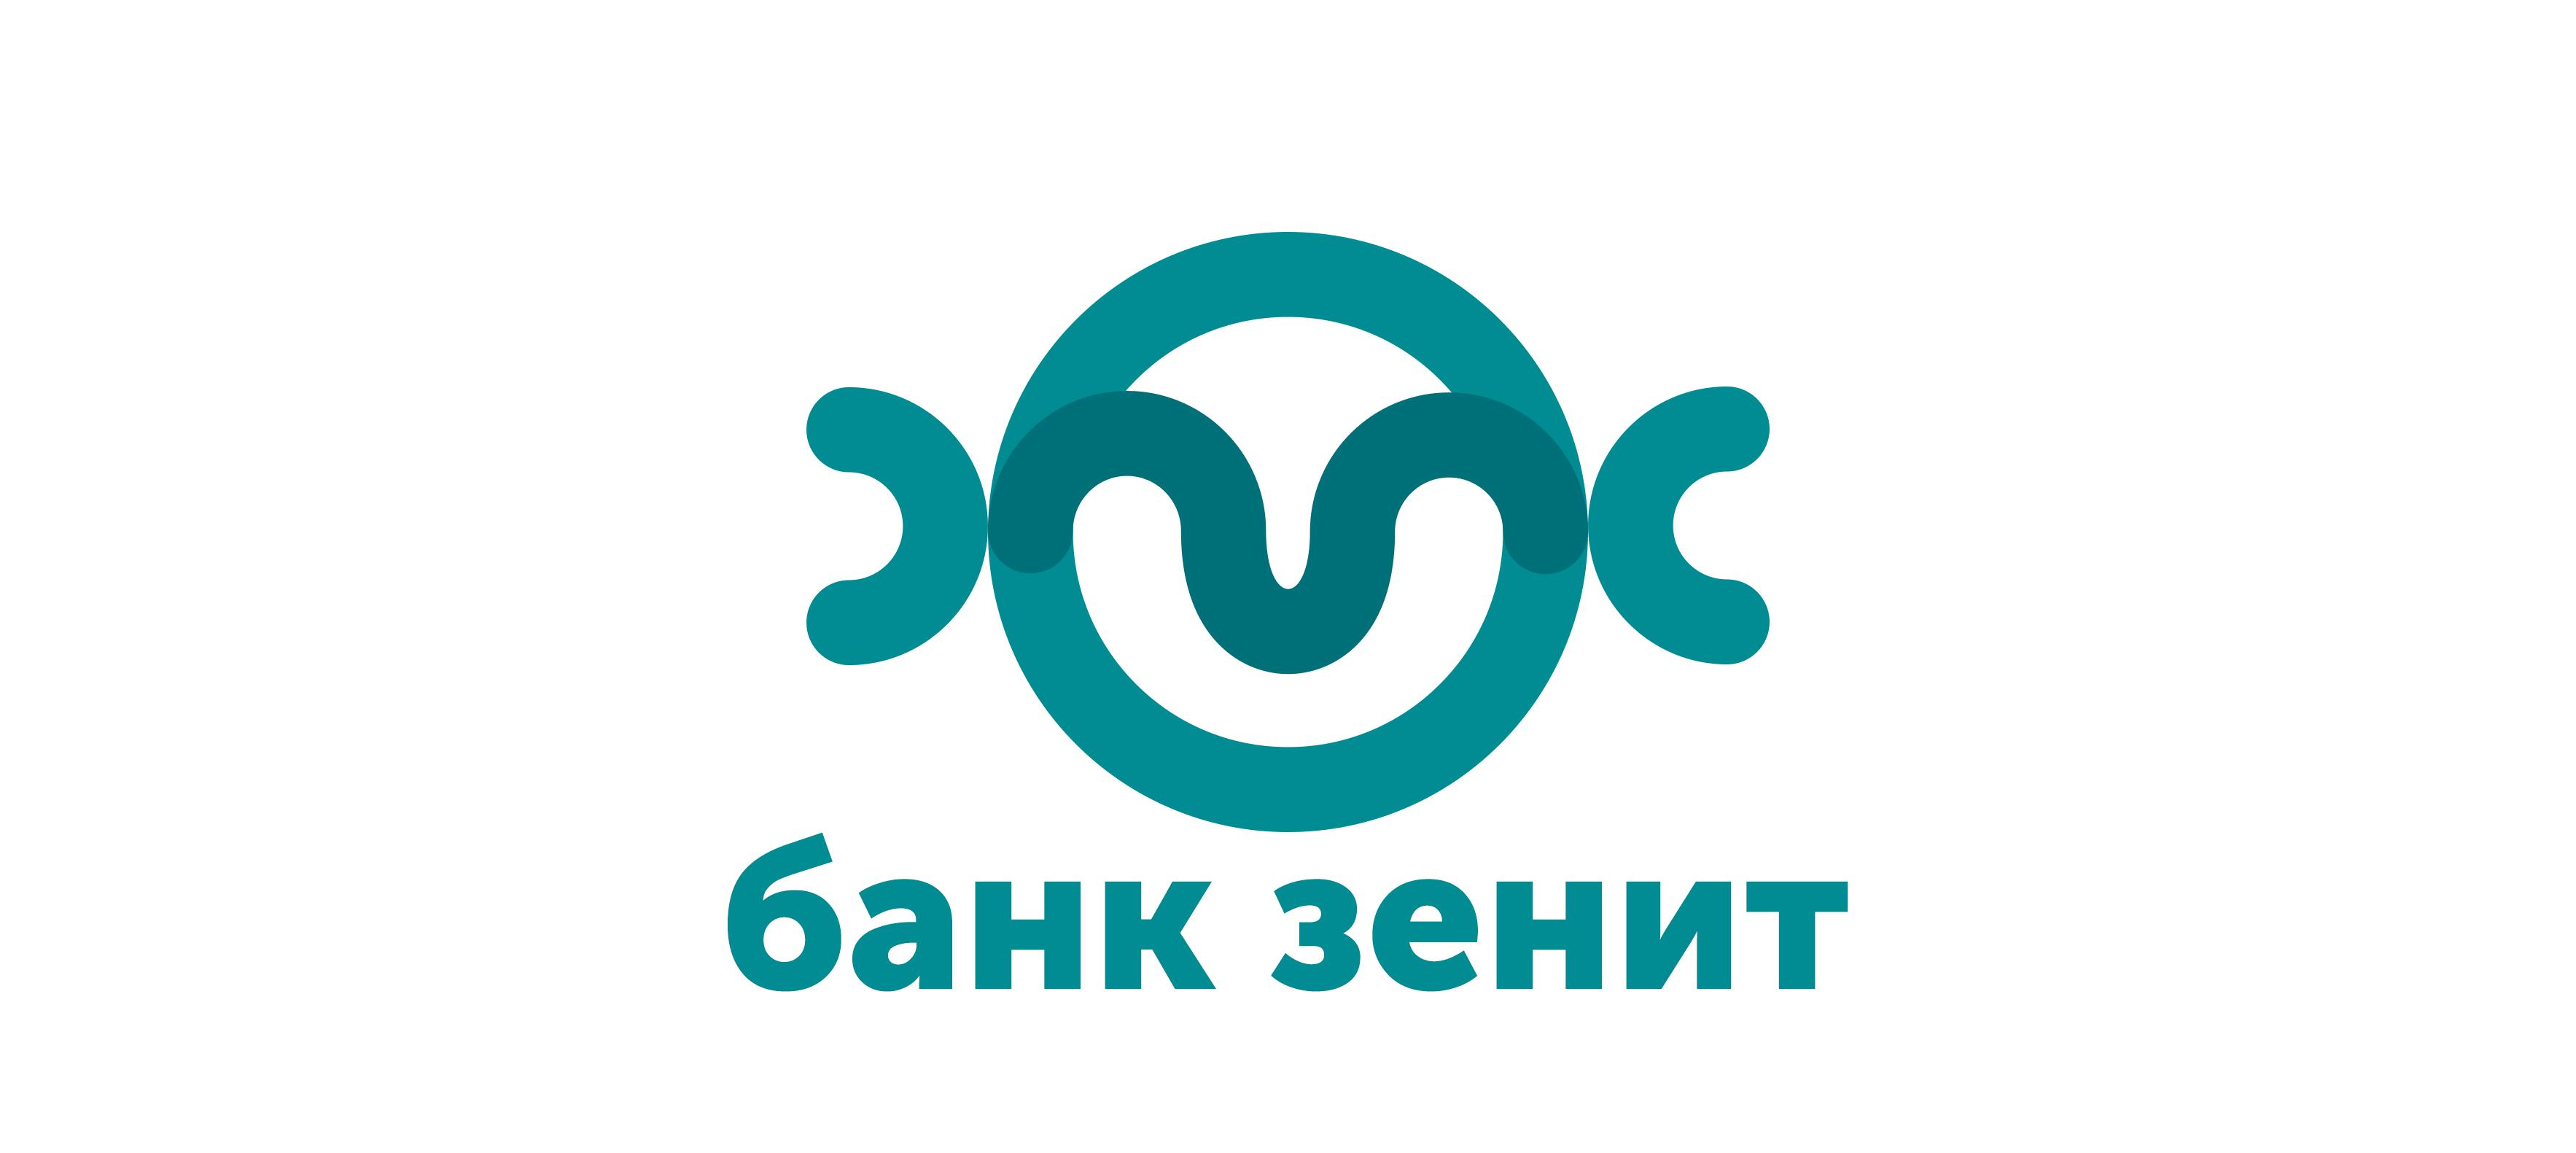 Разработка логотипа для Банка ЗЕНИТ фото f_7985b4b251d7fc0b.jpg